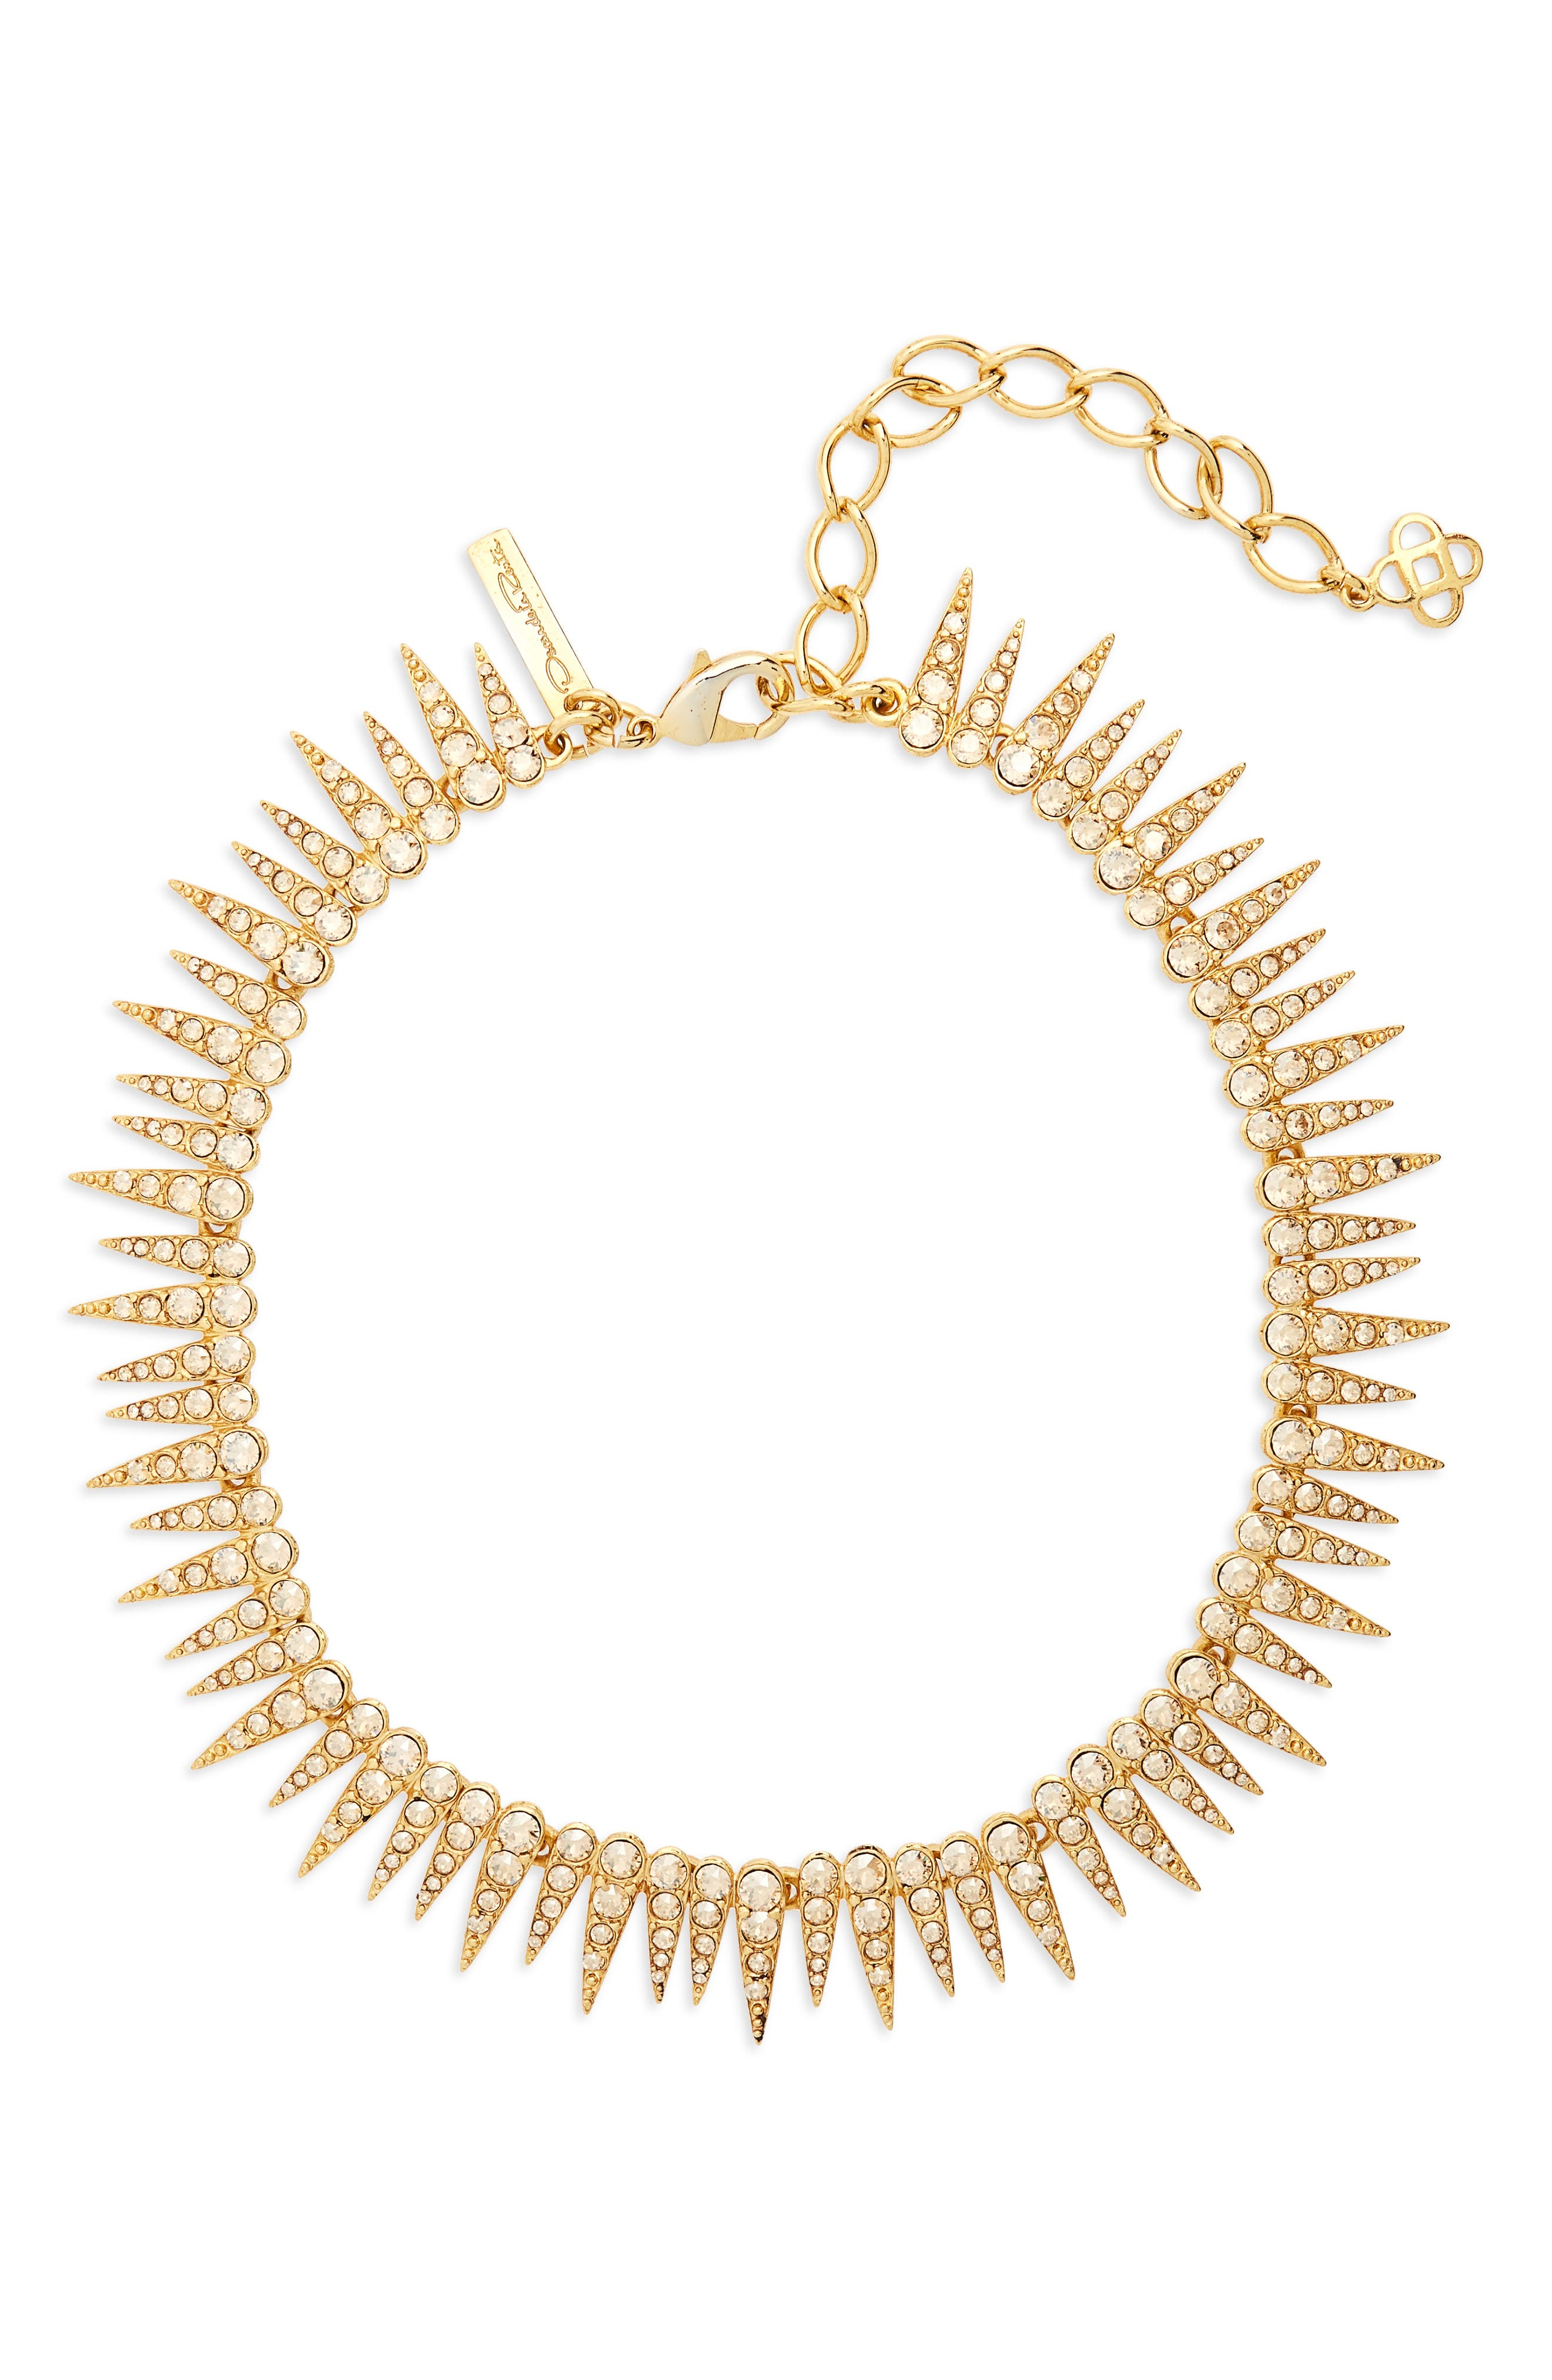 Crystal Sea Urchin Necklace,                             Main thumbnail 1, color,                             CRYSTAL GOLD SHADOW